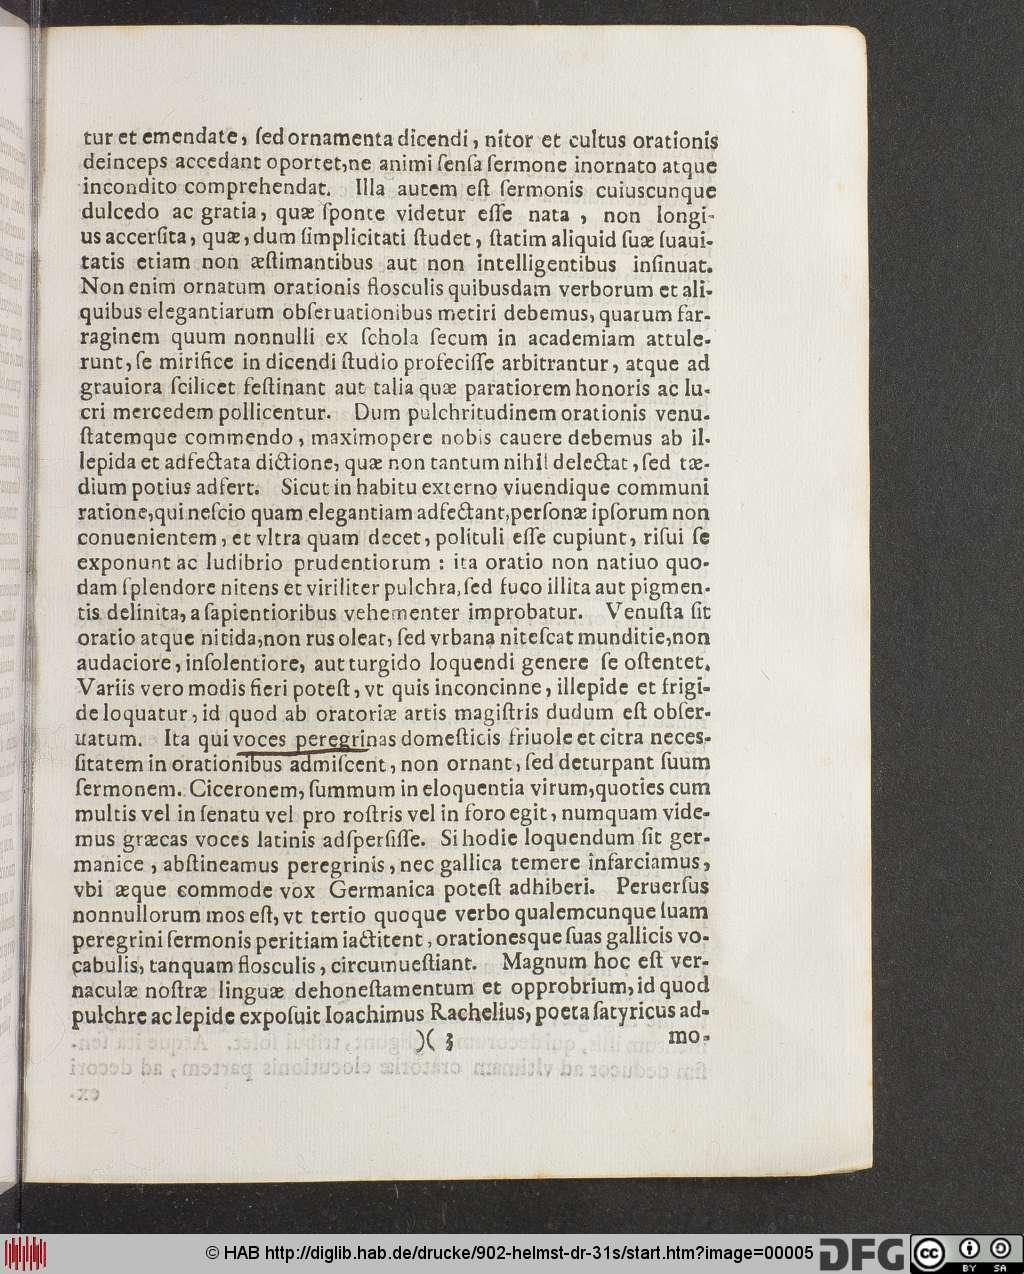 https://diglib.hab.de/drucke/902-helmst-dr-31s/00005.jpg